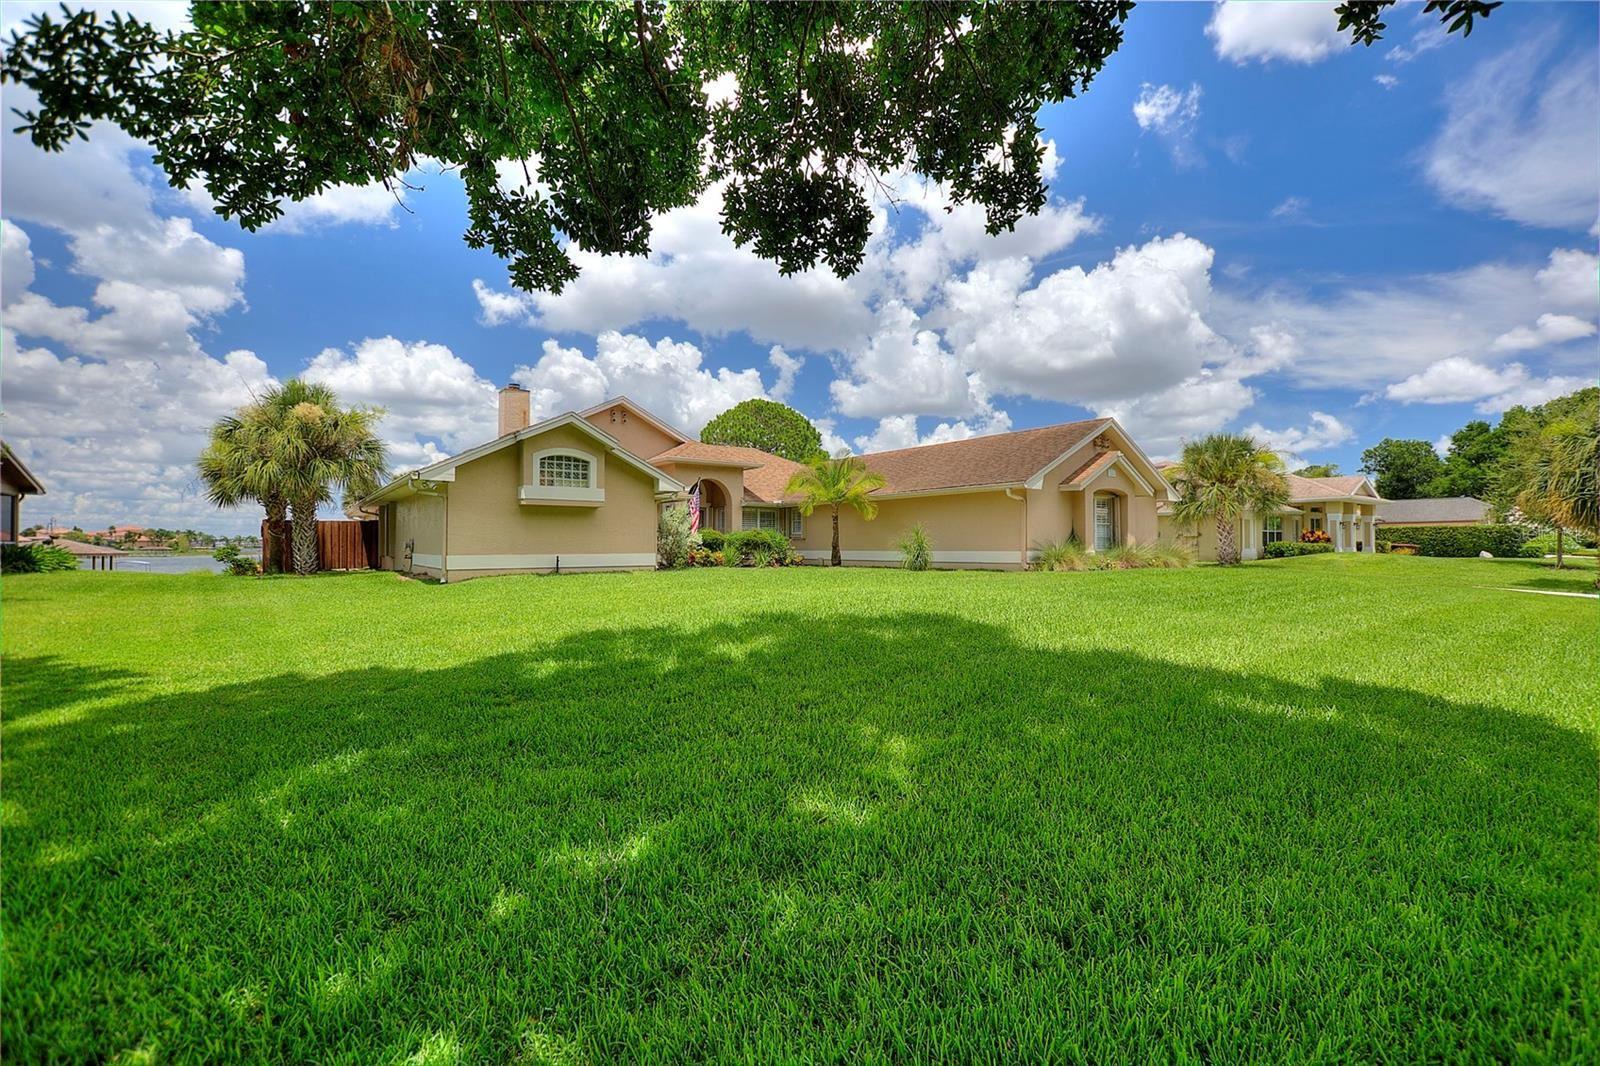 7645 POINTVIEW CIRCLE, Orlando, FL 32836 - #: O5963958